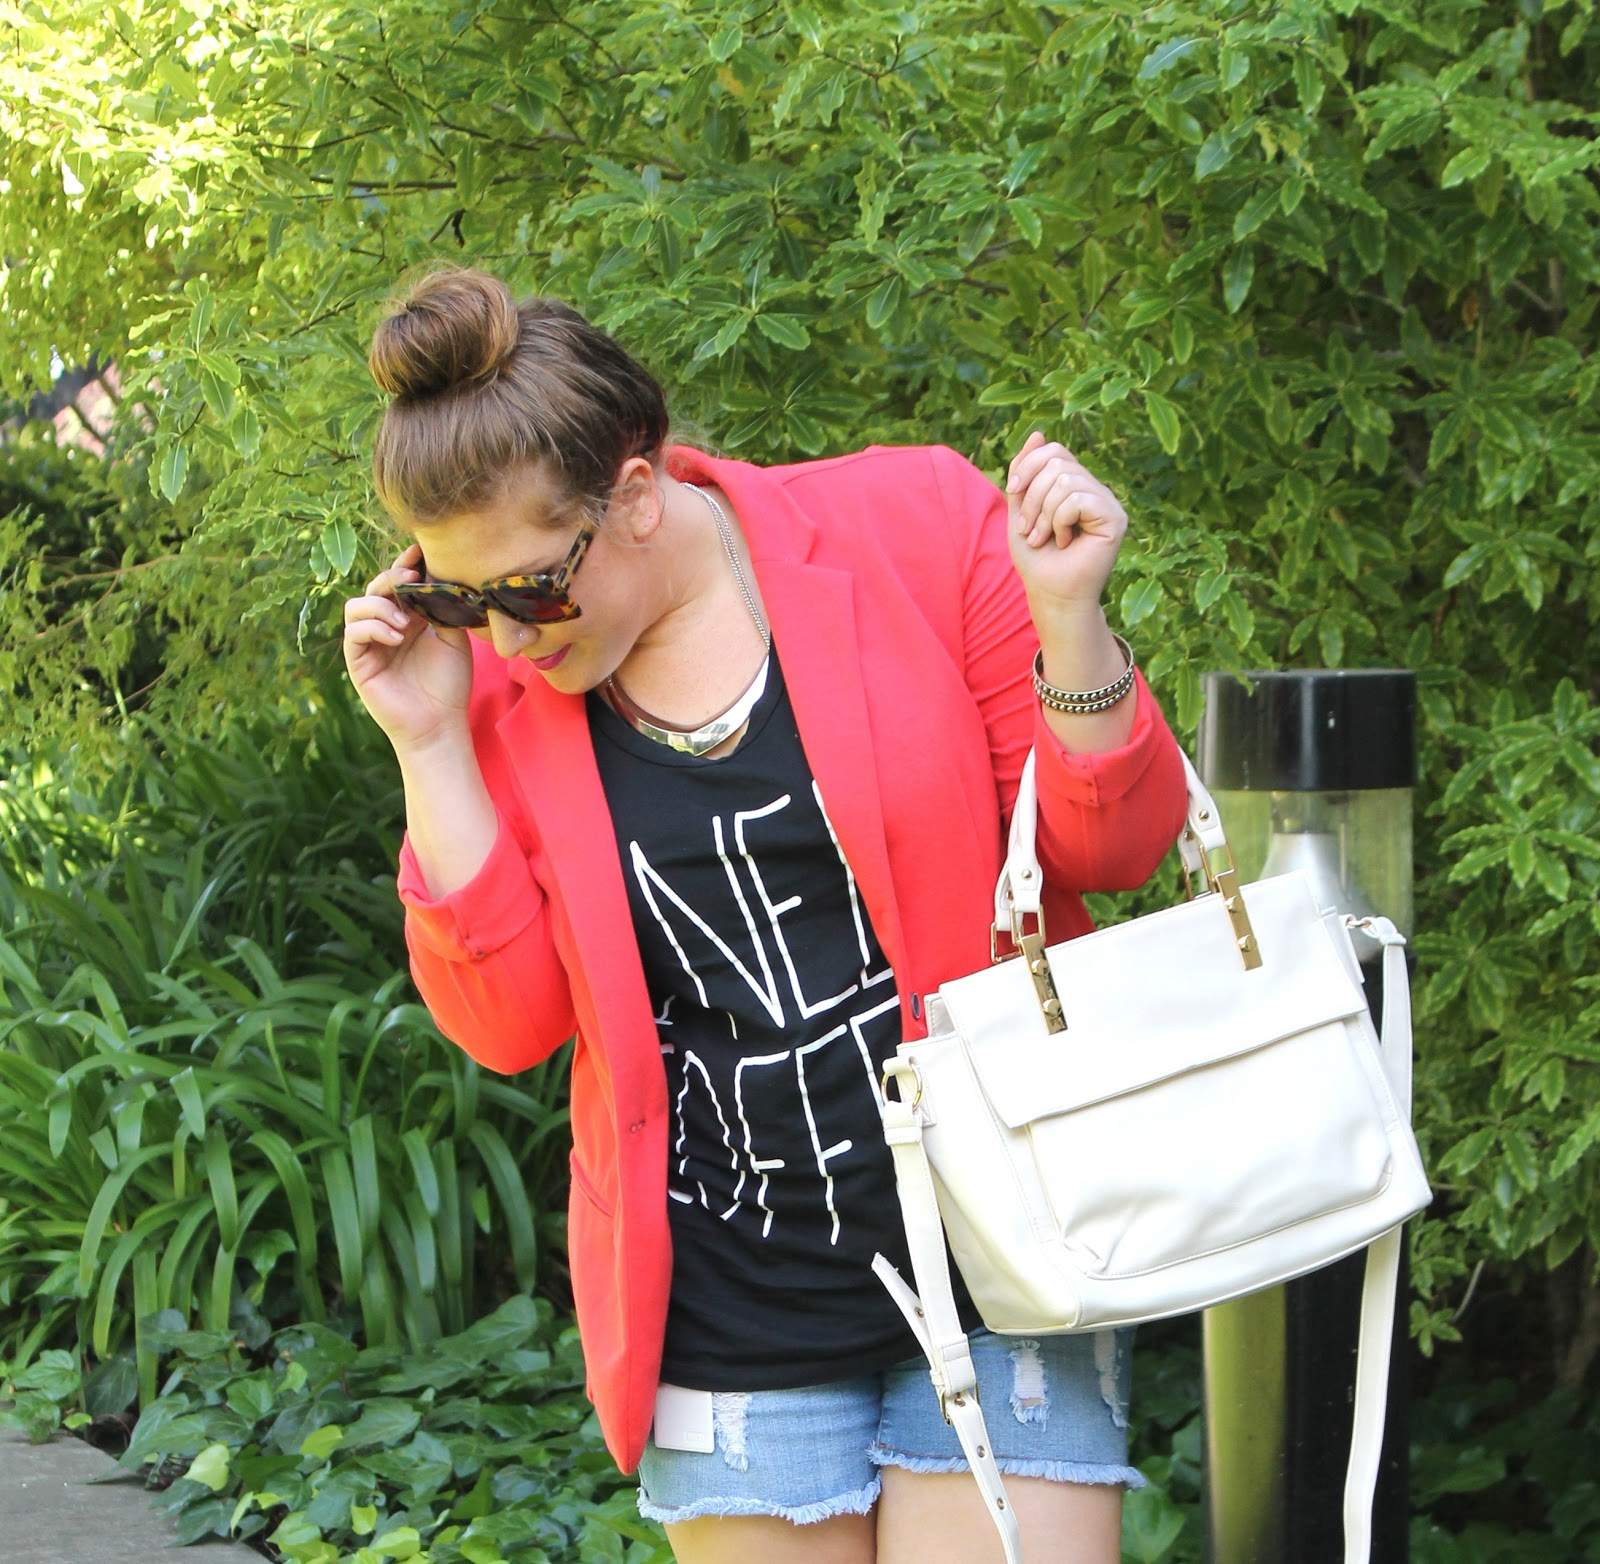 Shorts, Necklace   T-shirt  Forever 21    Blazer  Target    Bag and Flats   Asos    Sunglasses  Karen Walker via Poshmark 5f2e9ed04a